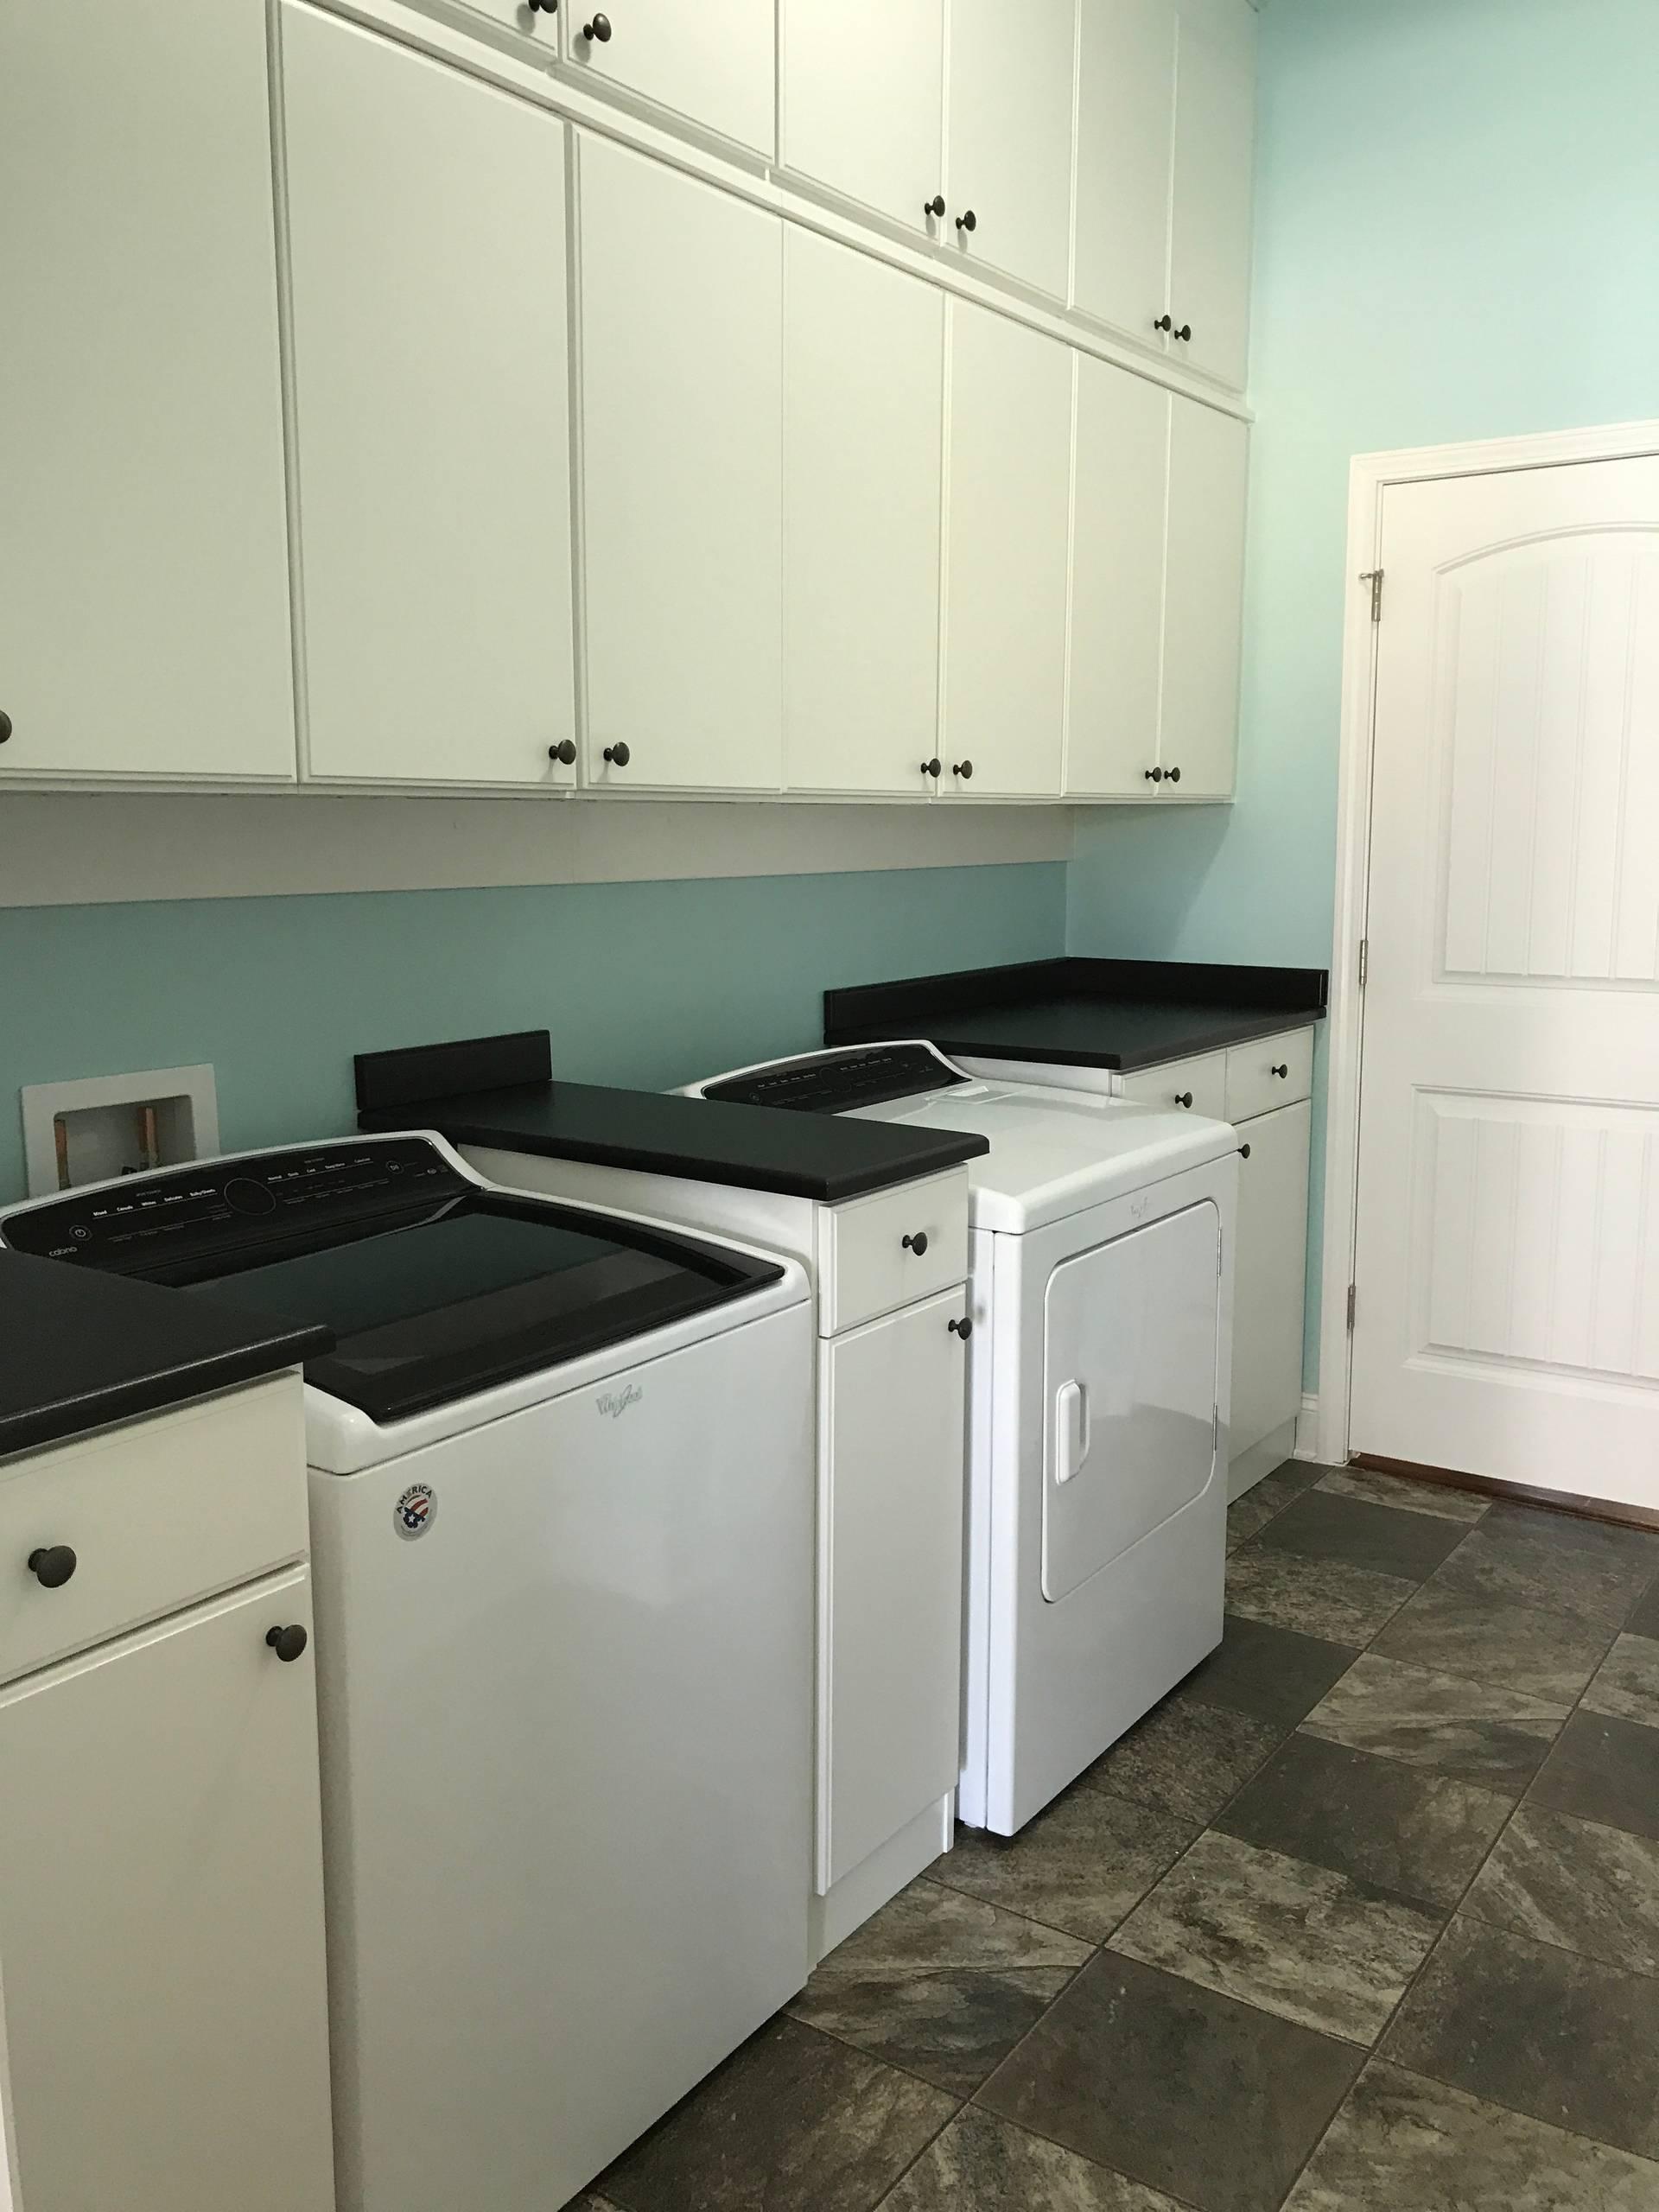 Laundry Room in Greer, SC